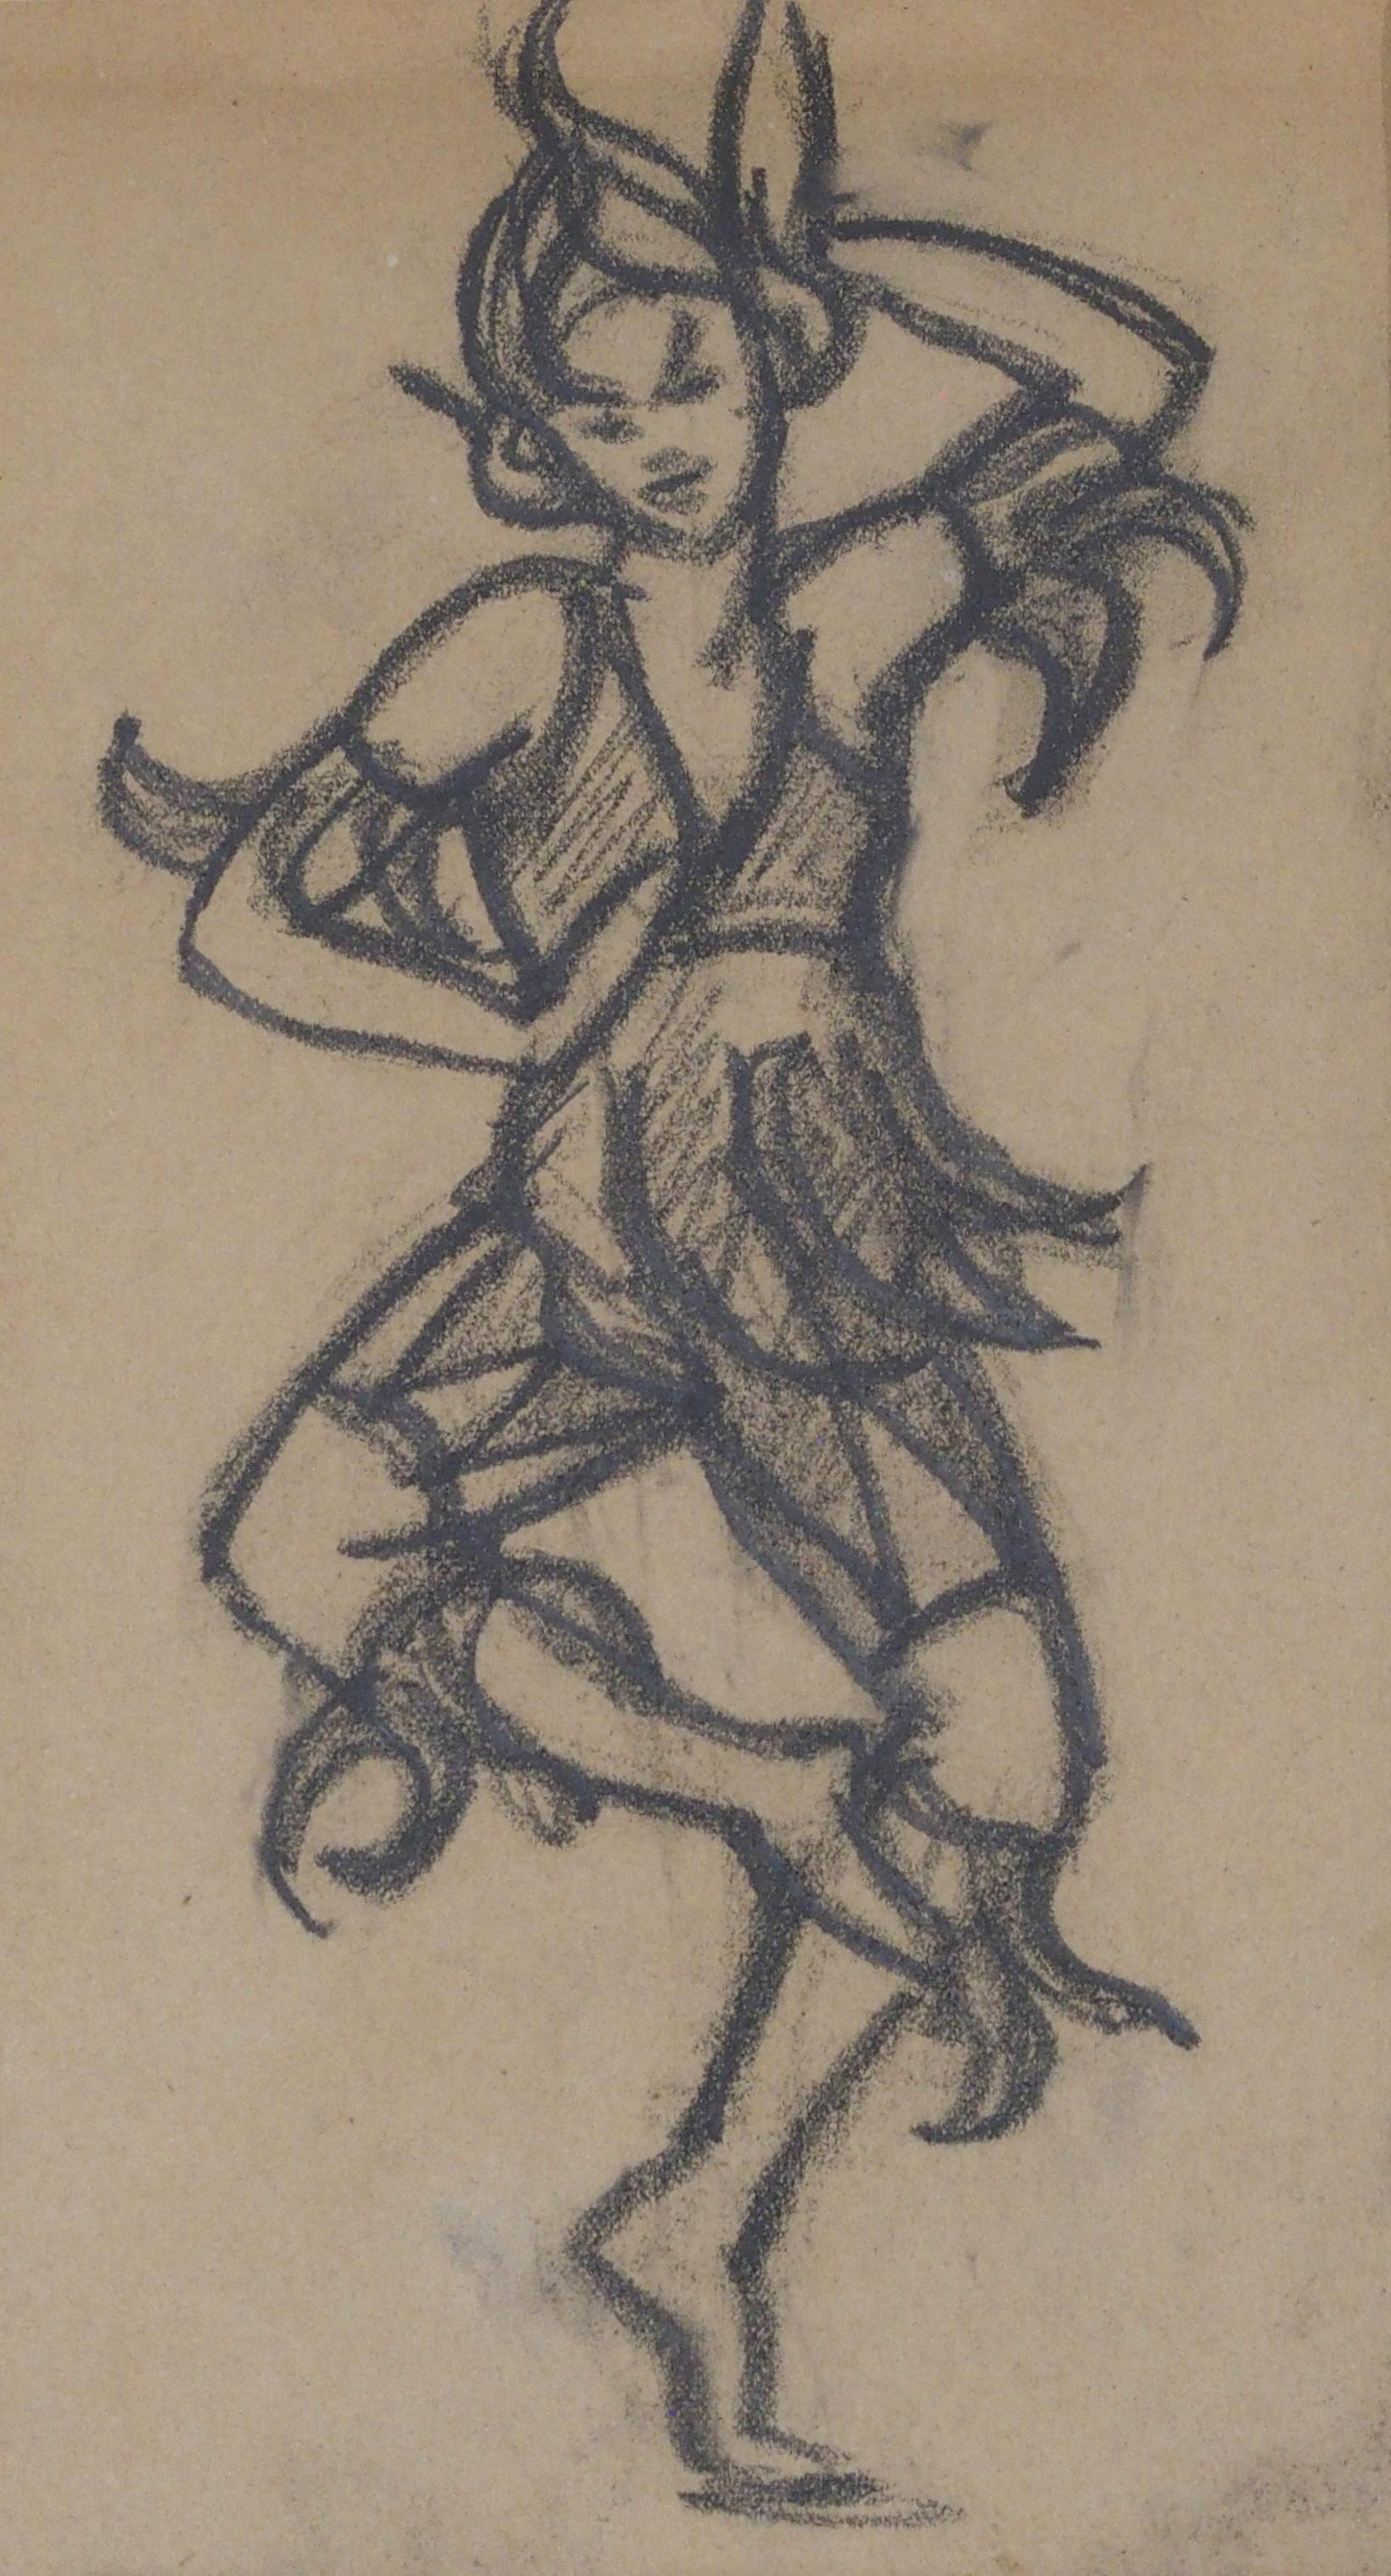 •MARGARET MORRIS (SCOTTISH 1891-1980) COSTUME DESIGN FOR ASHNUR DANCERS 1937 charcoal, 22 x 12cm